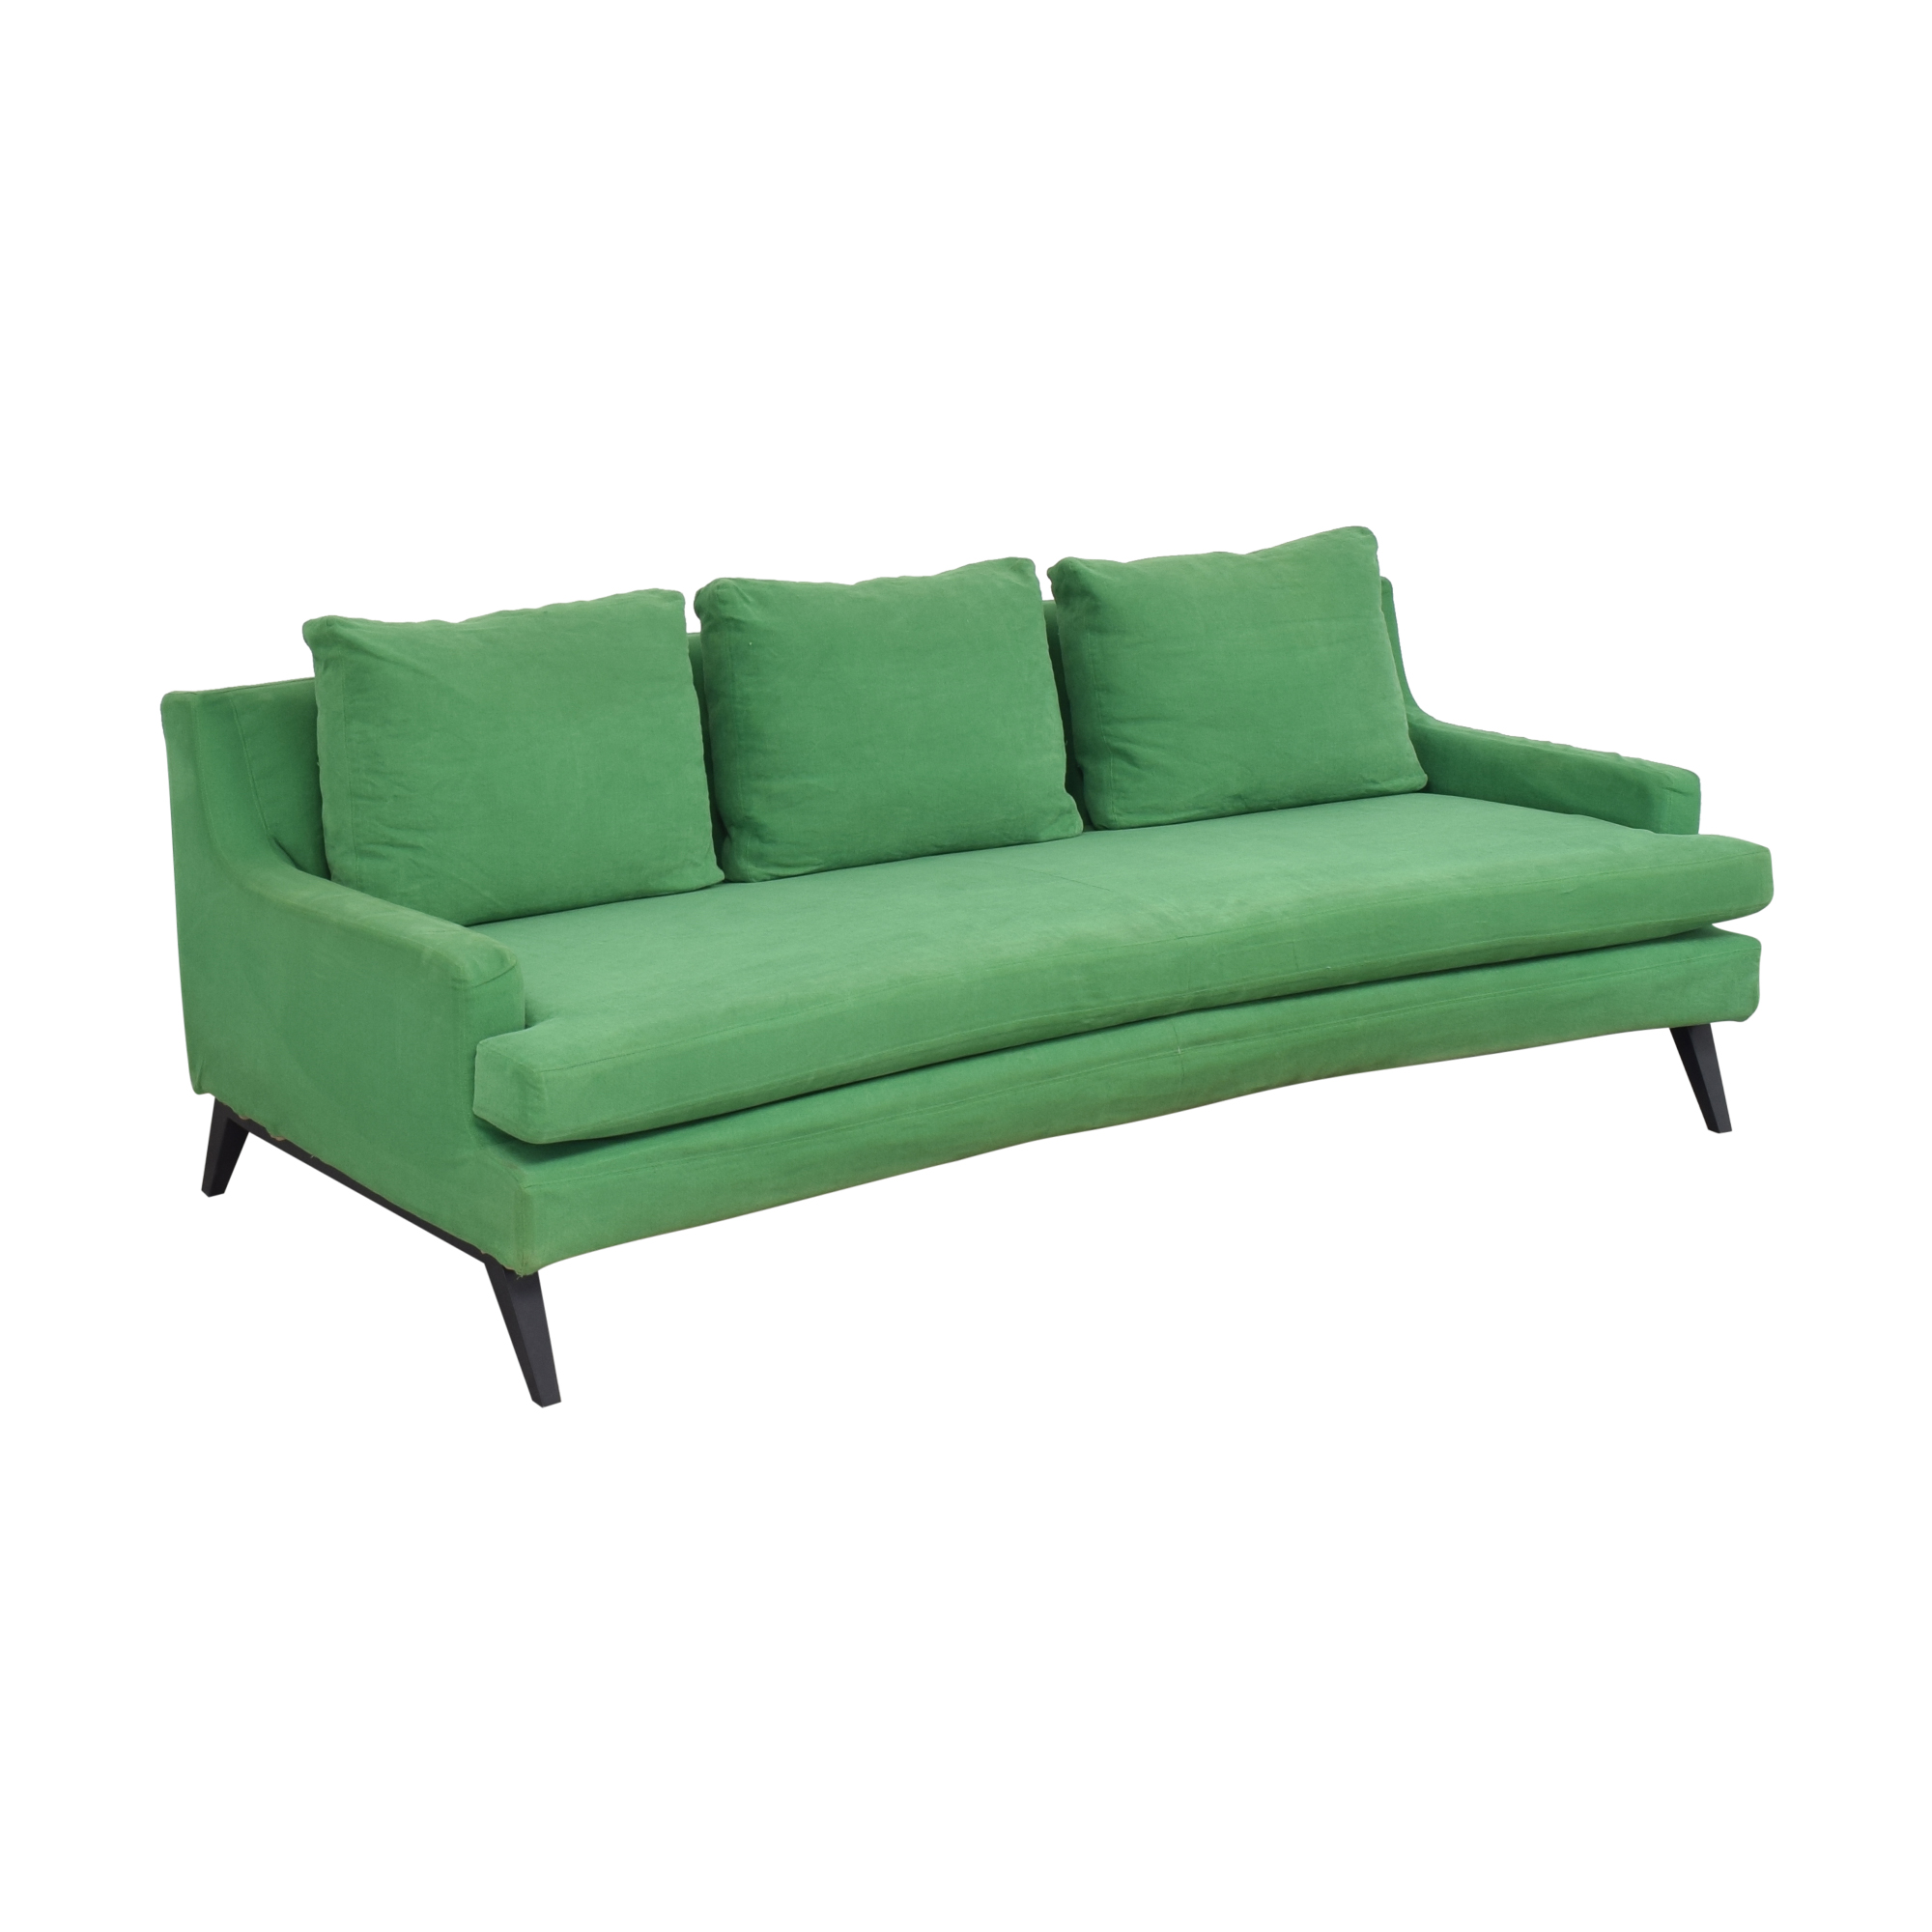 Ligne Roset Ligne Roset Belem Bench Cushion Sofa second hand